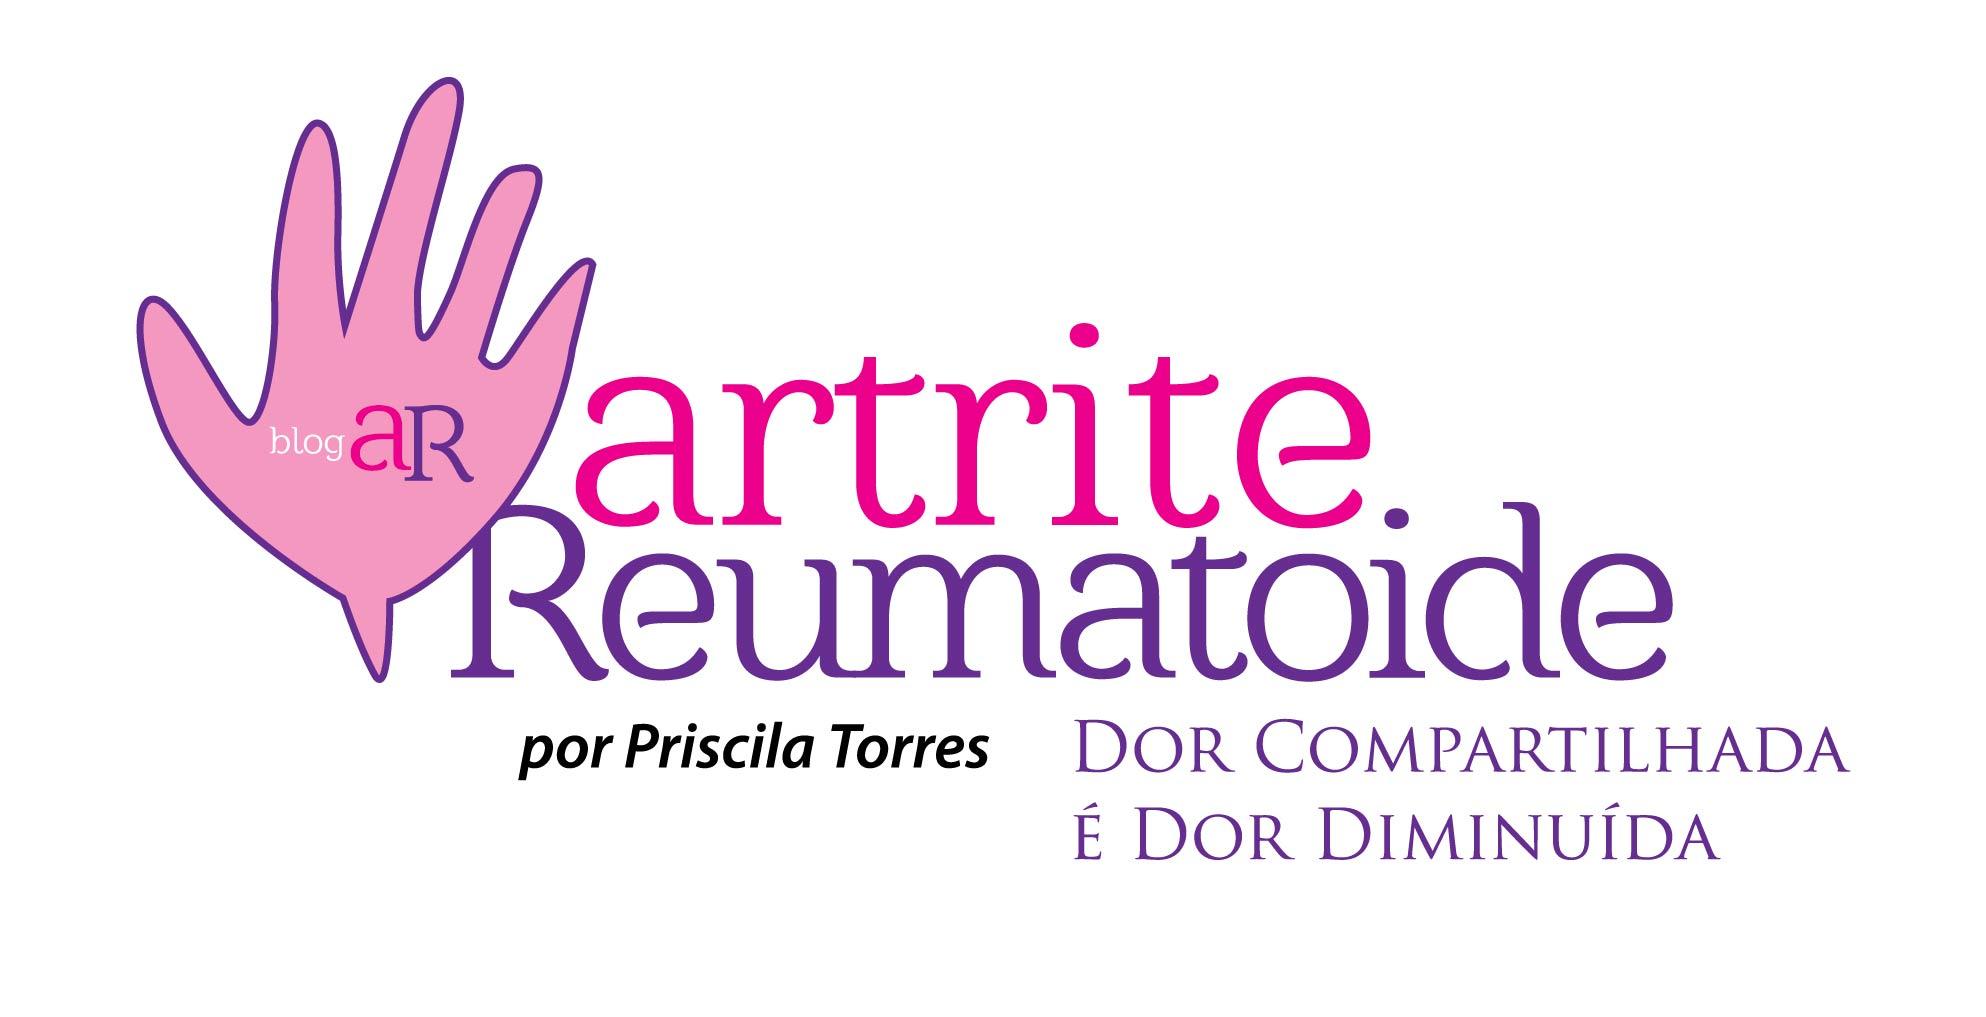 10718_Artrite_Reumatoide_310715-01